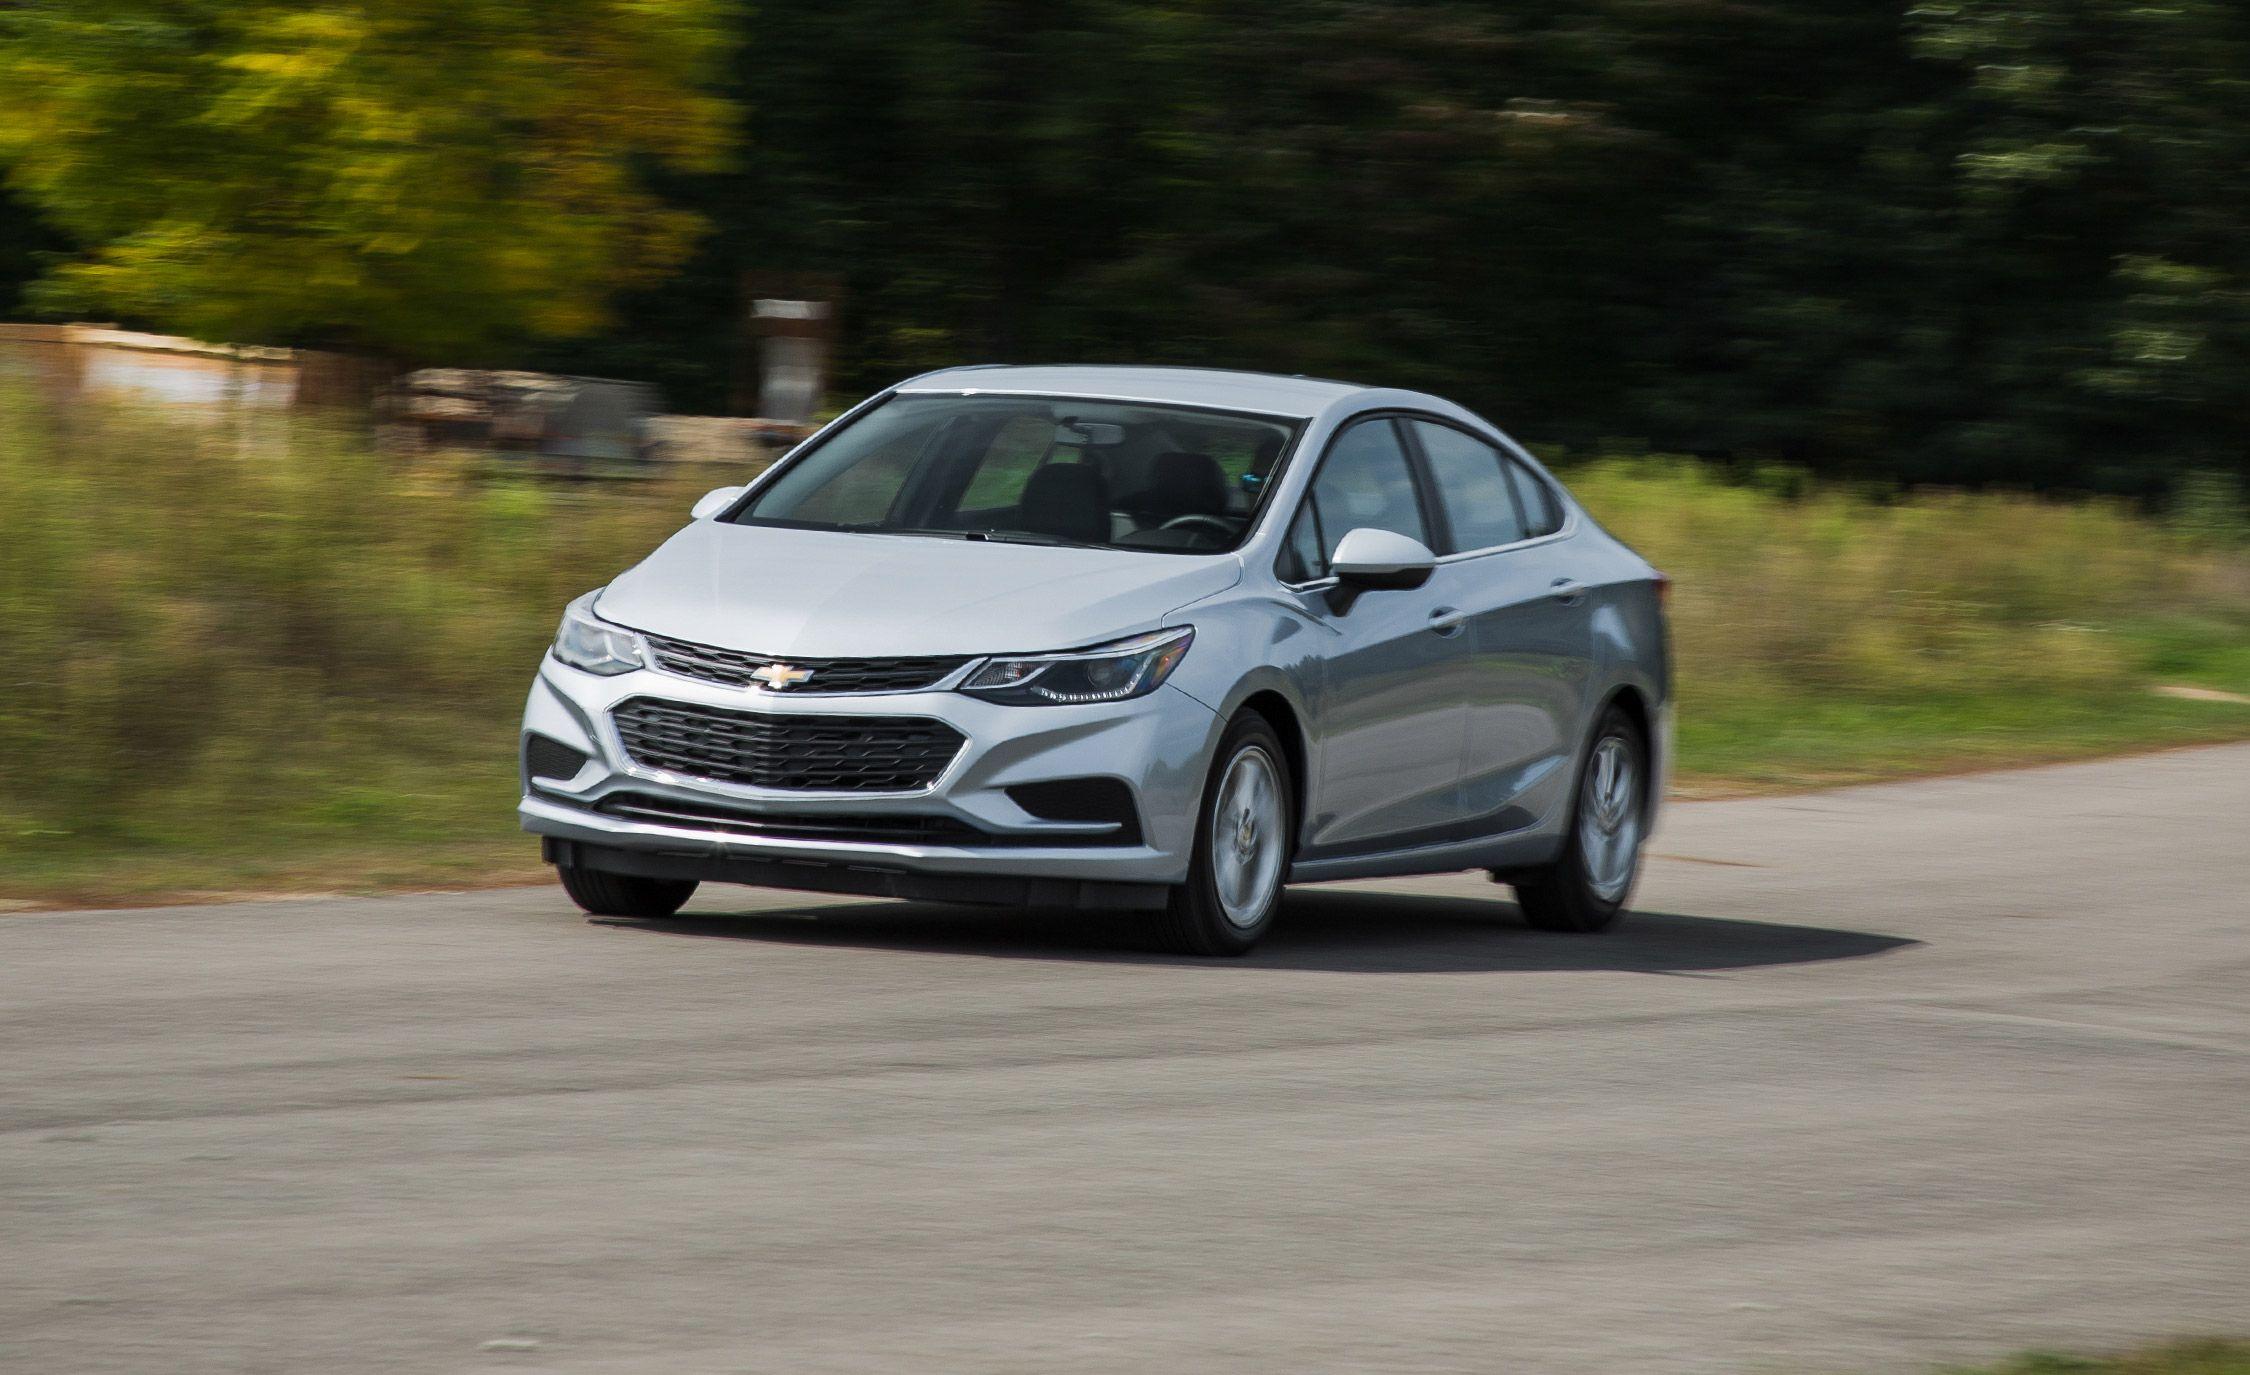 Kelebihan Kekurangan Cruze Chevrolet Review